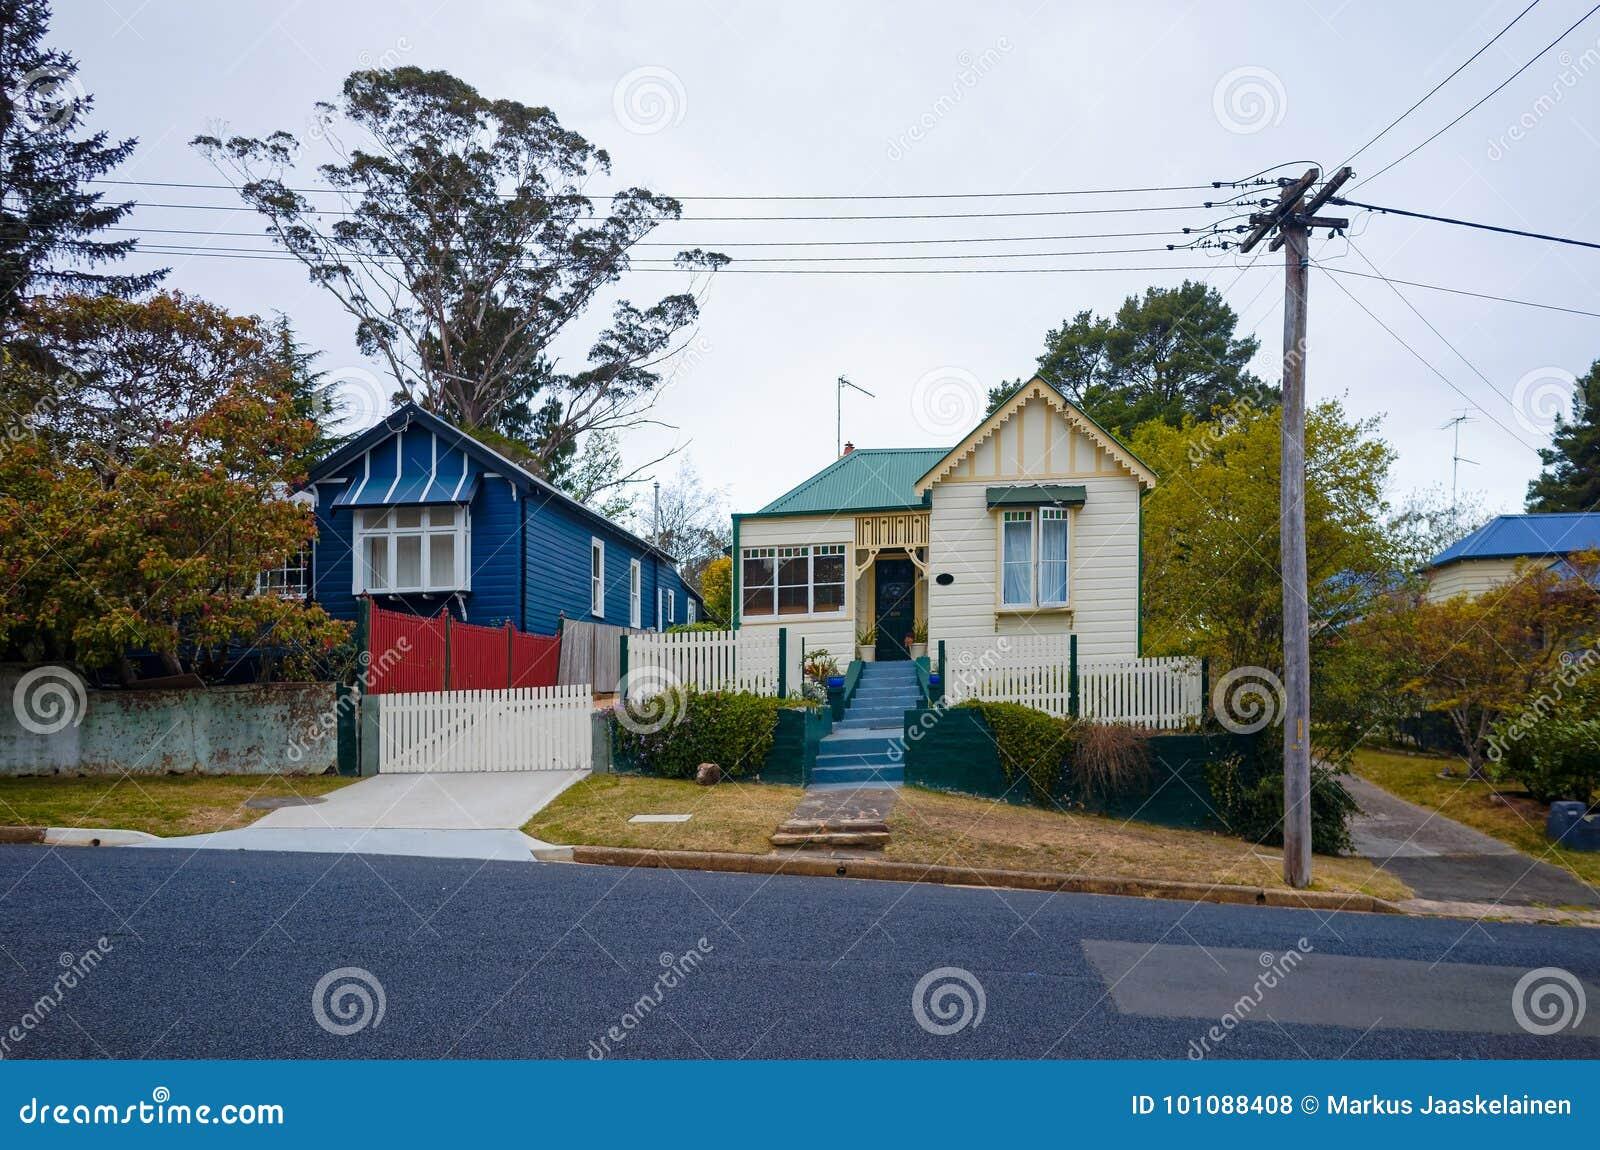 Wooden buildings in an Australian suburb